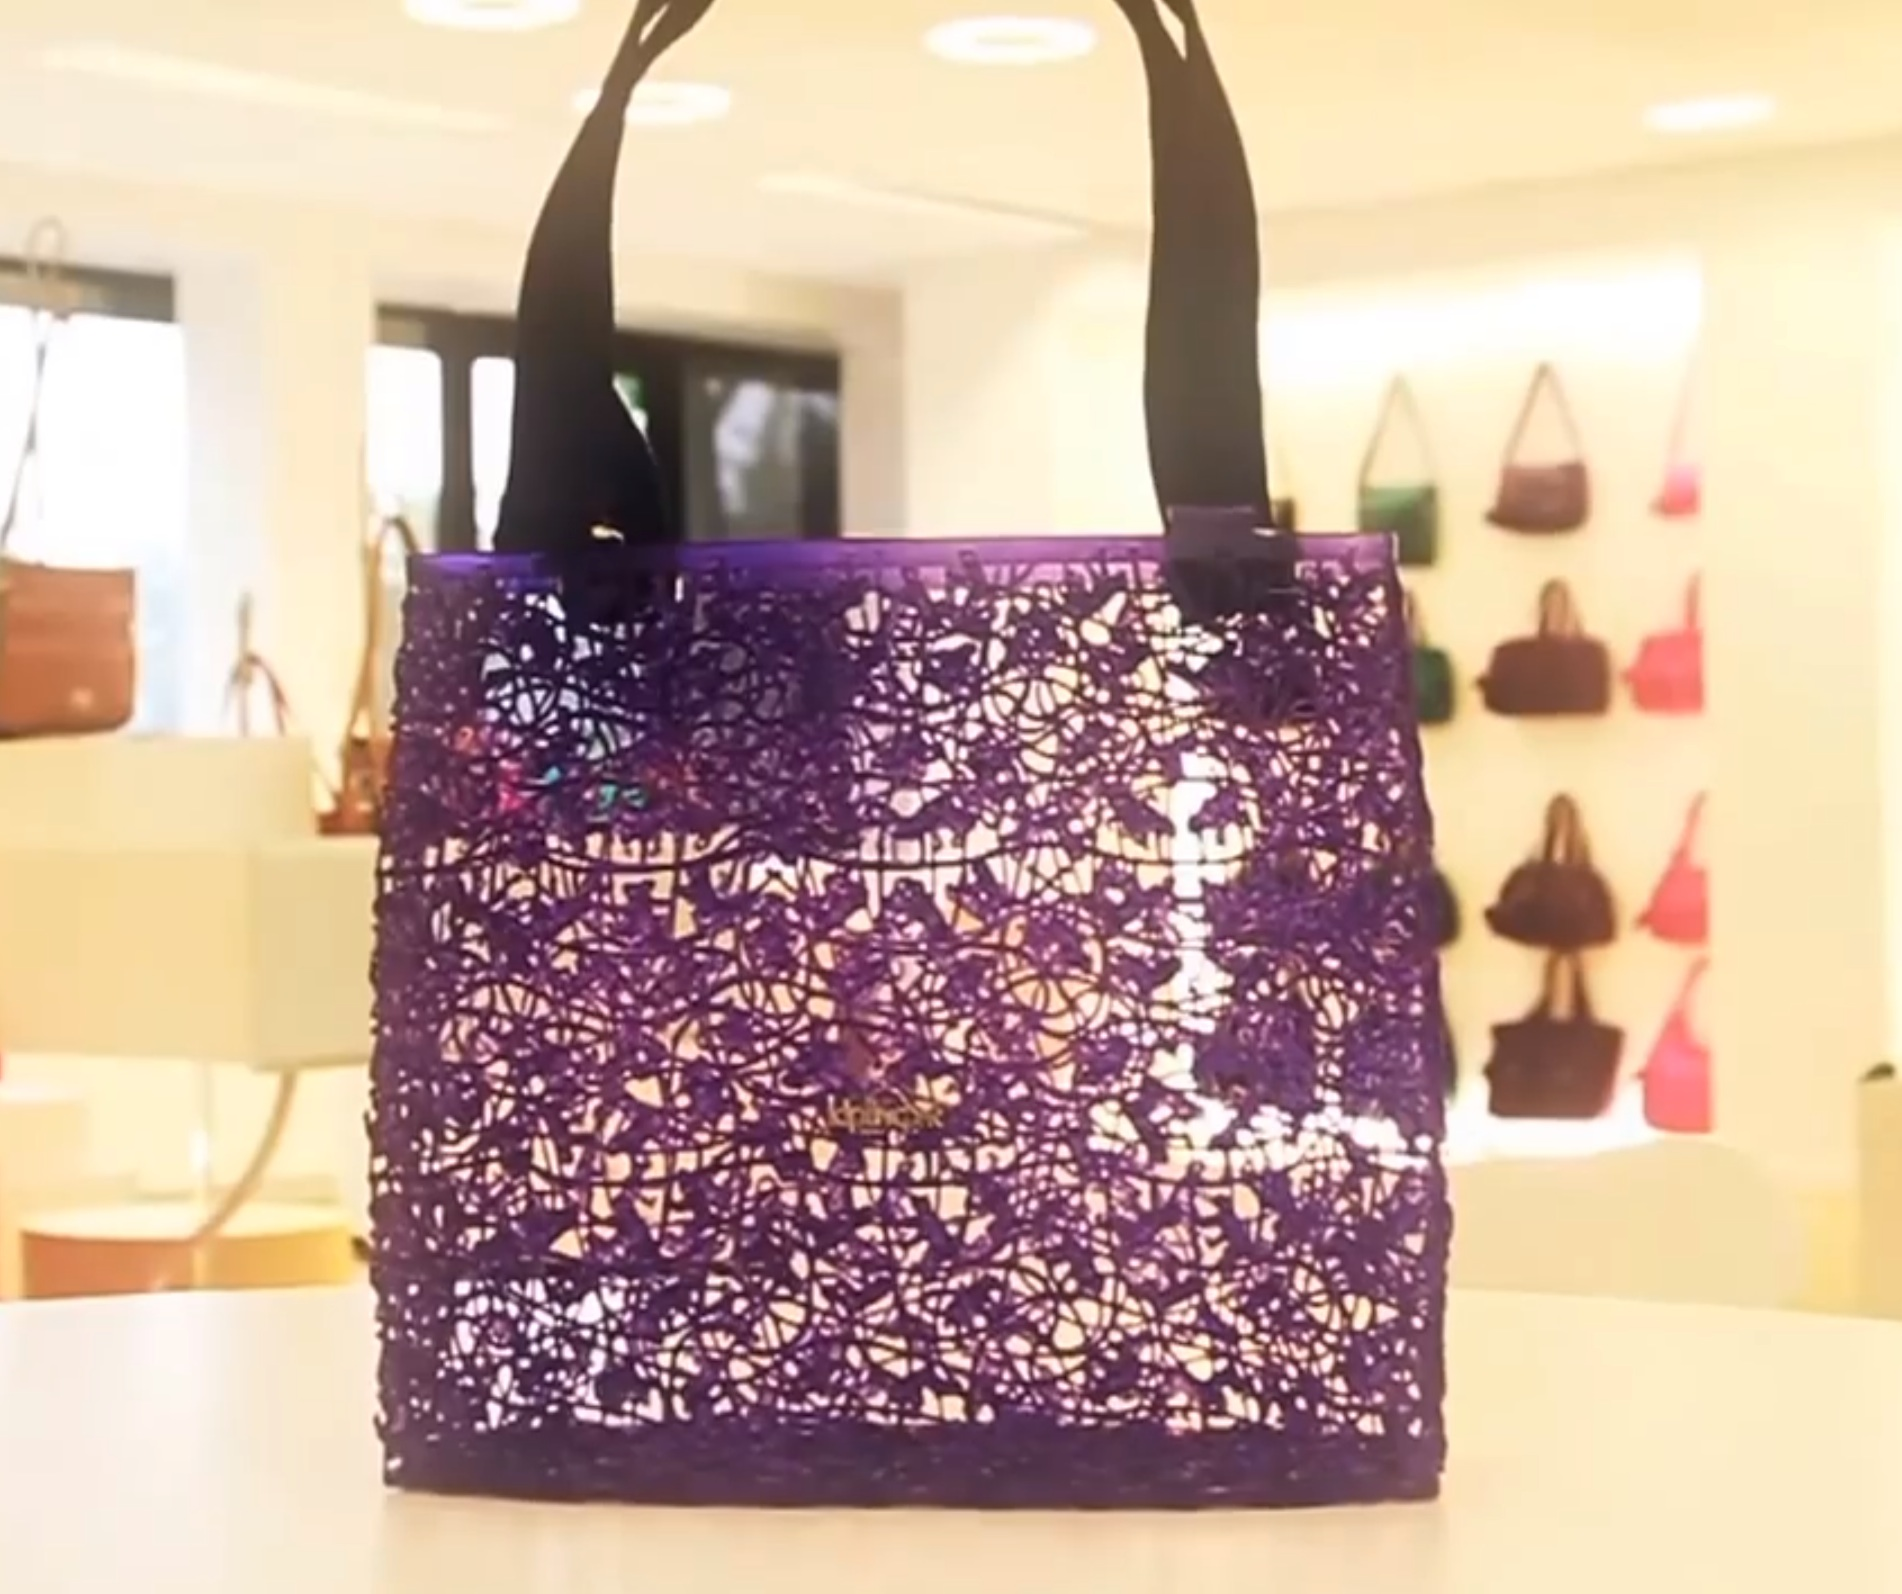 Win a Free 3D Printed Flexible Bag